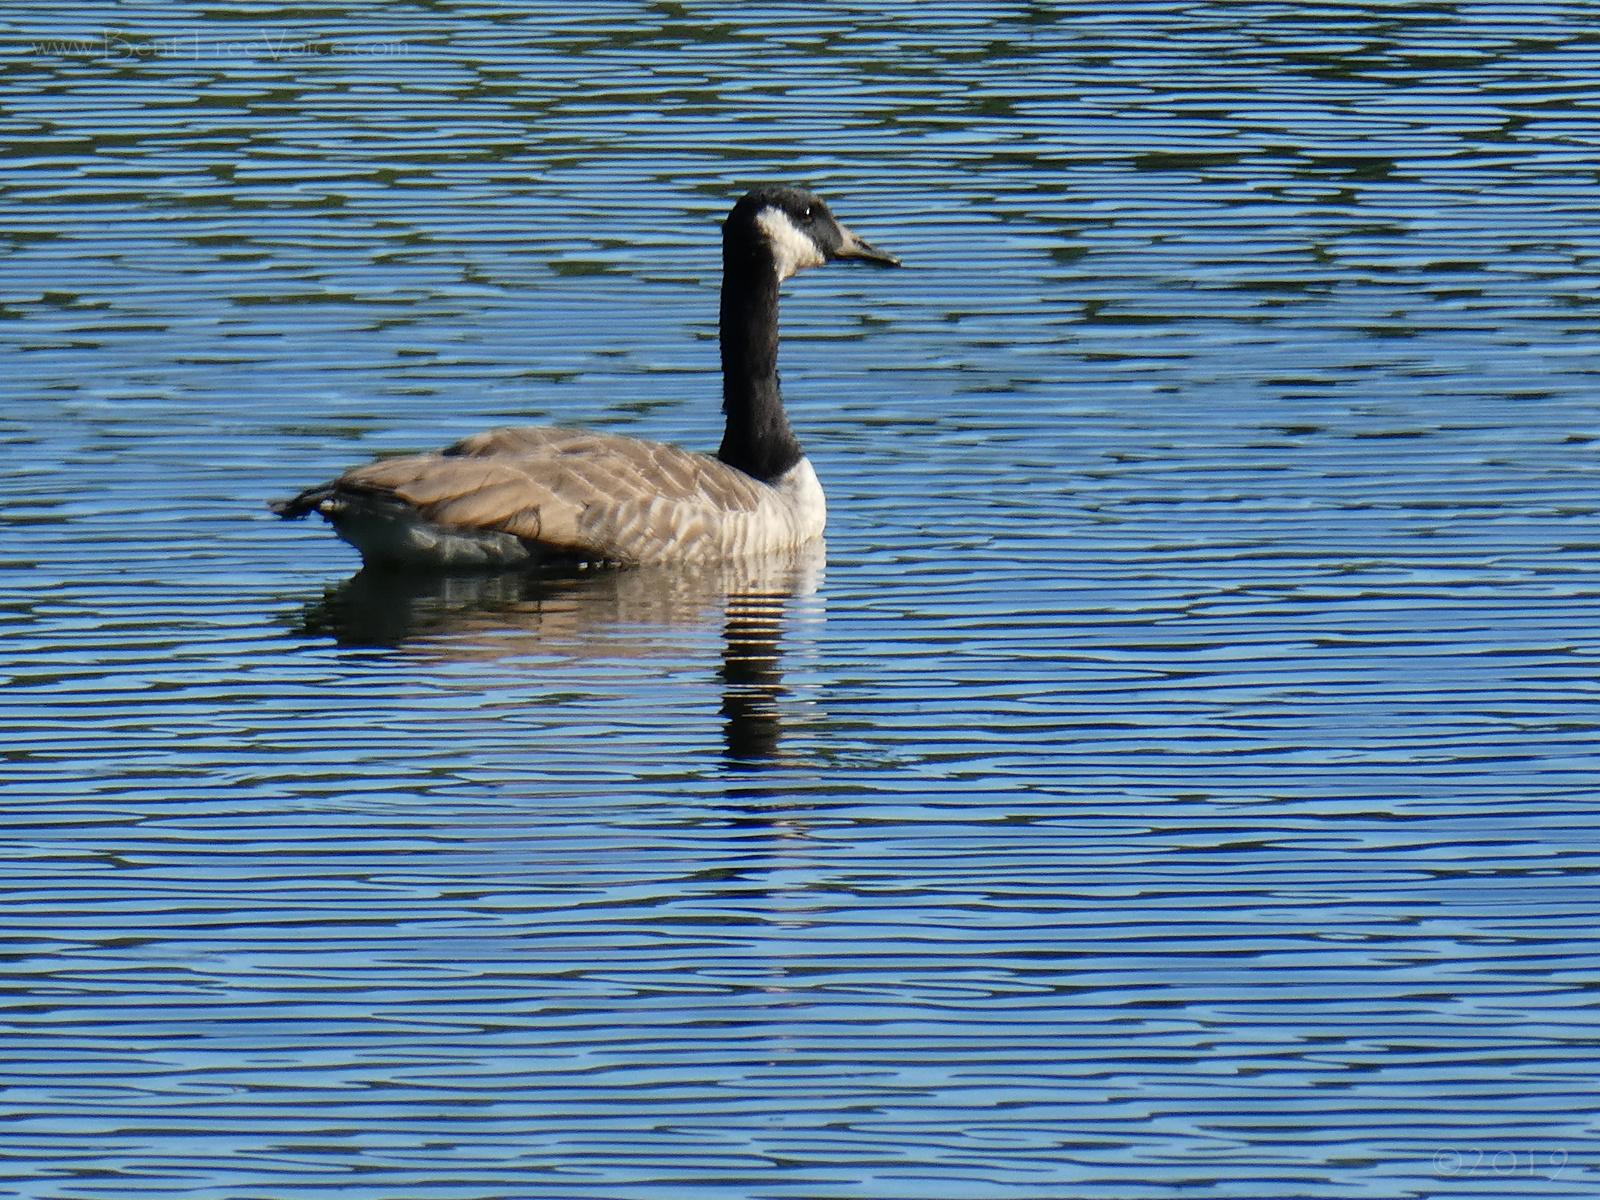 September 6, 2019 - Lake Tamarack in Bent Tree